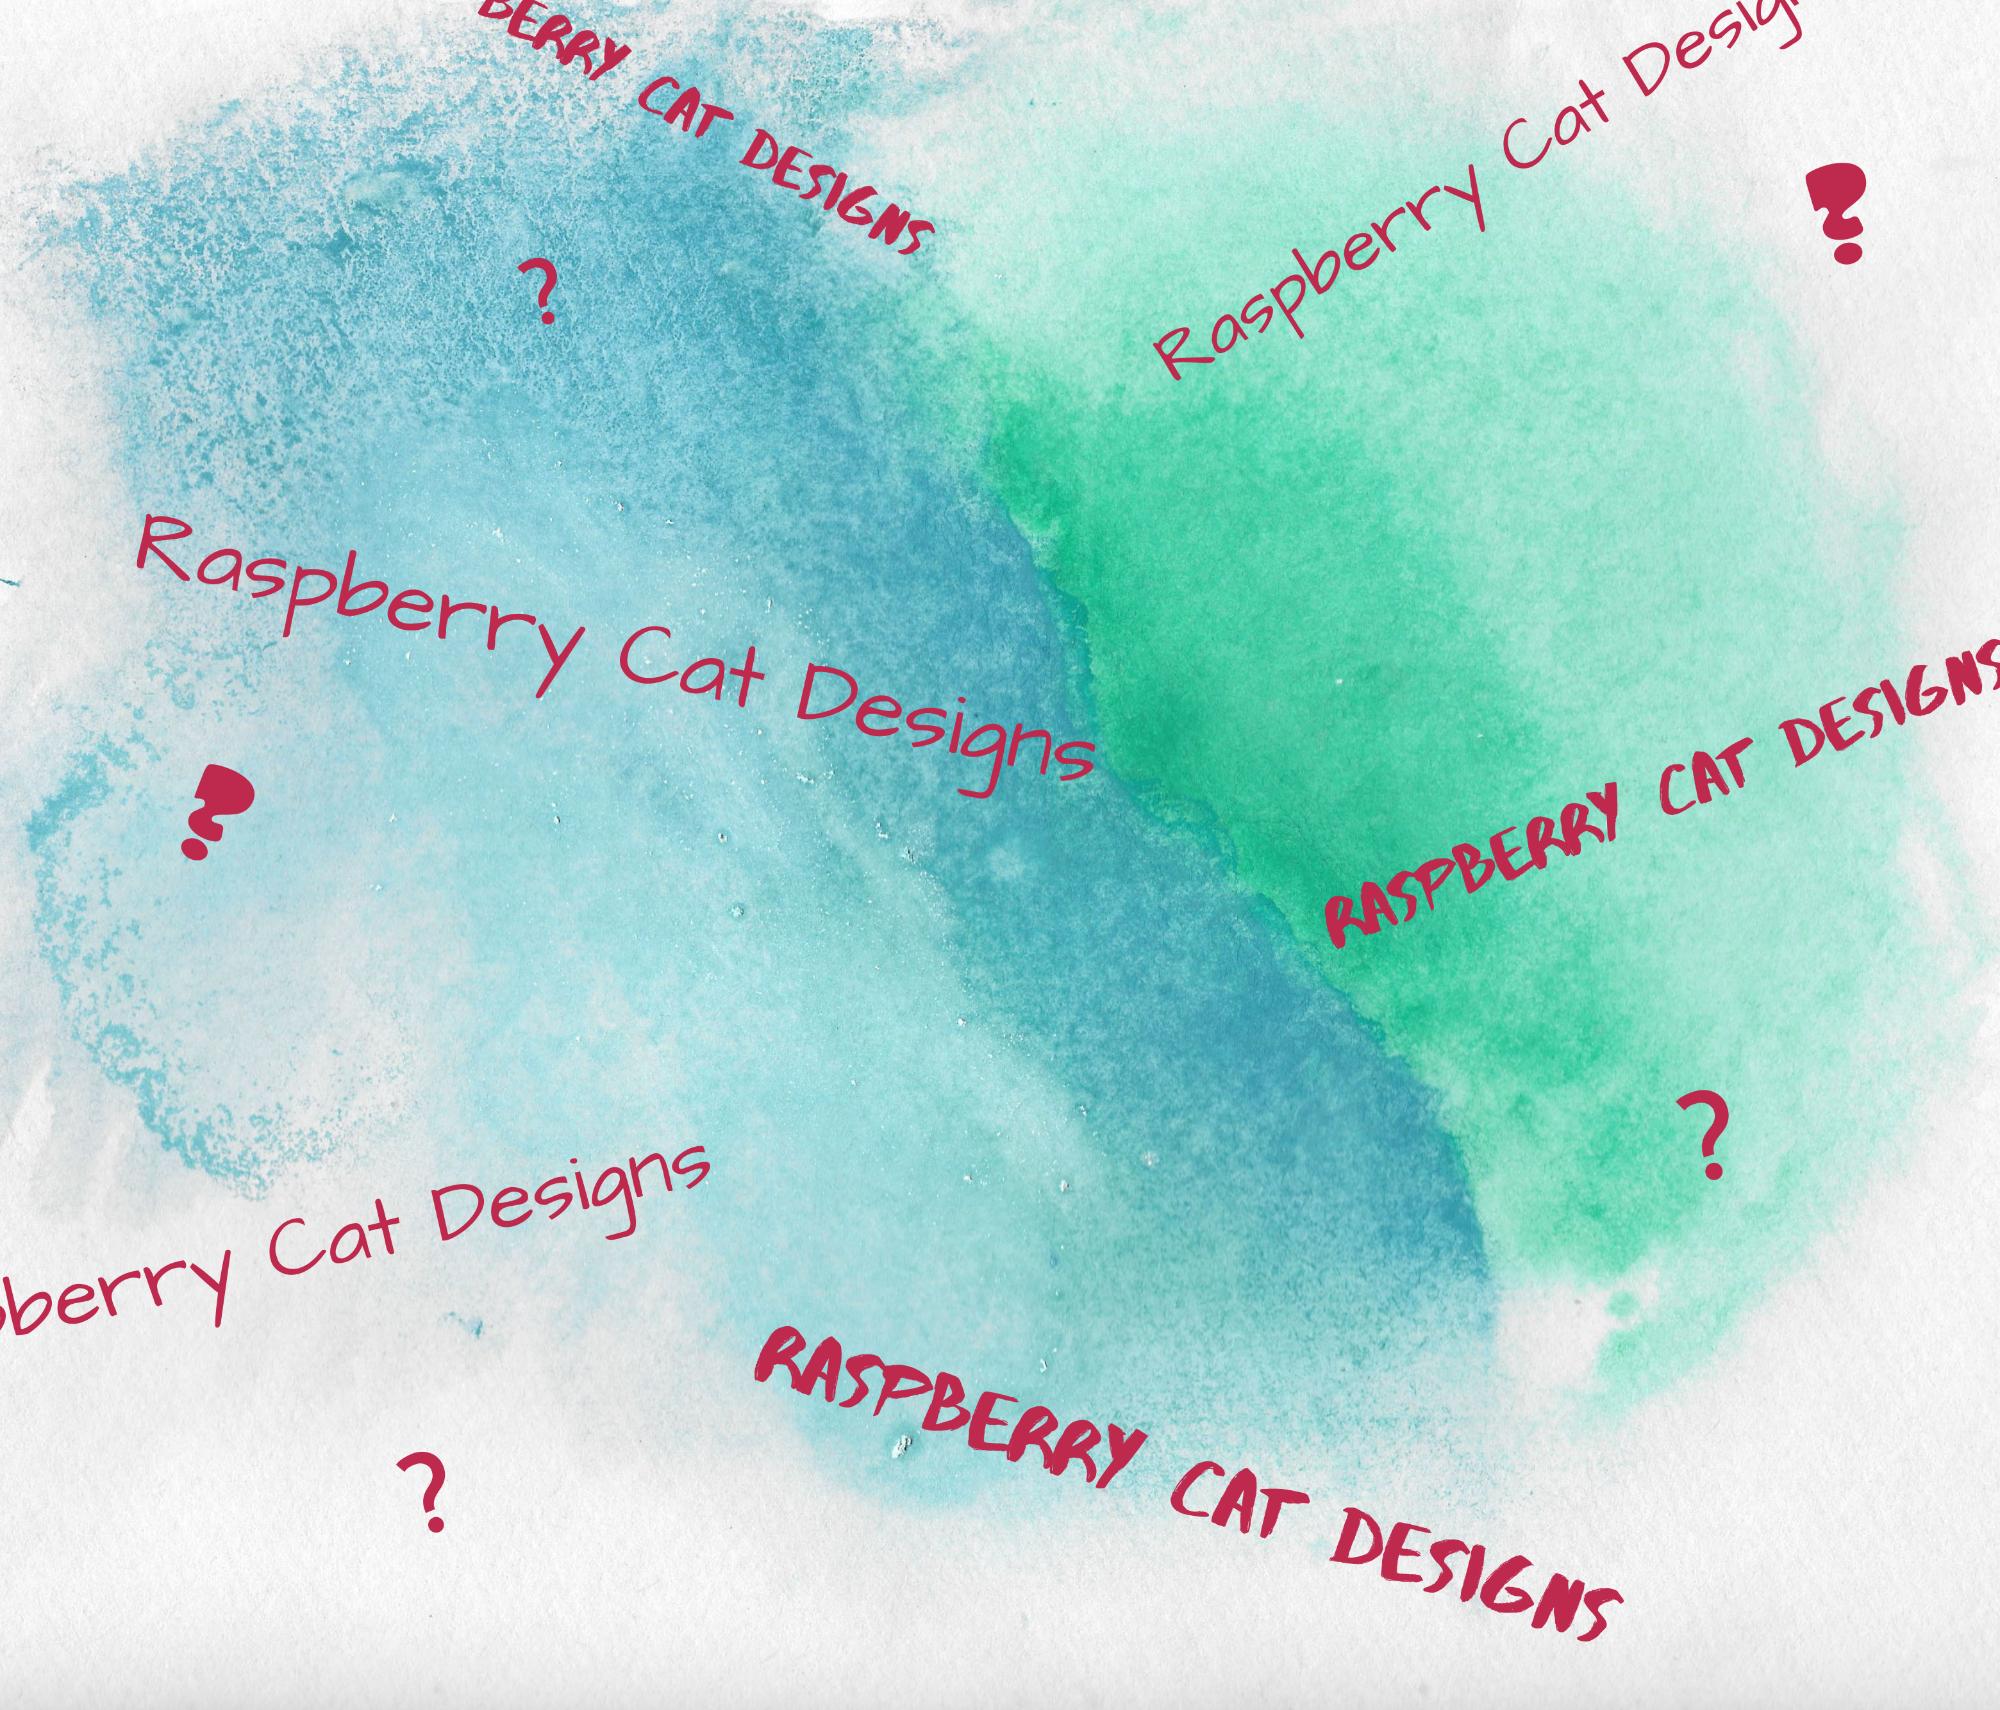 Raspberry cat designs blog